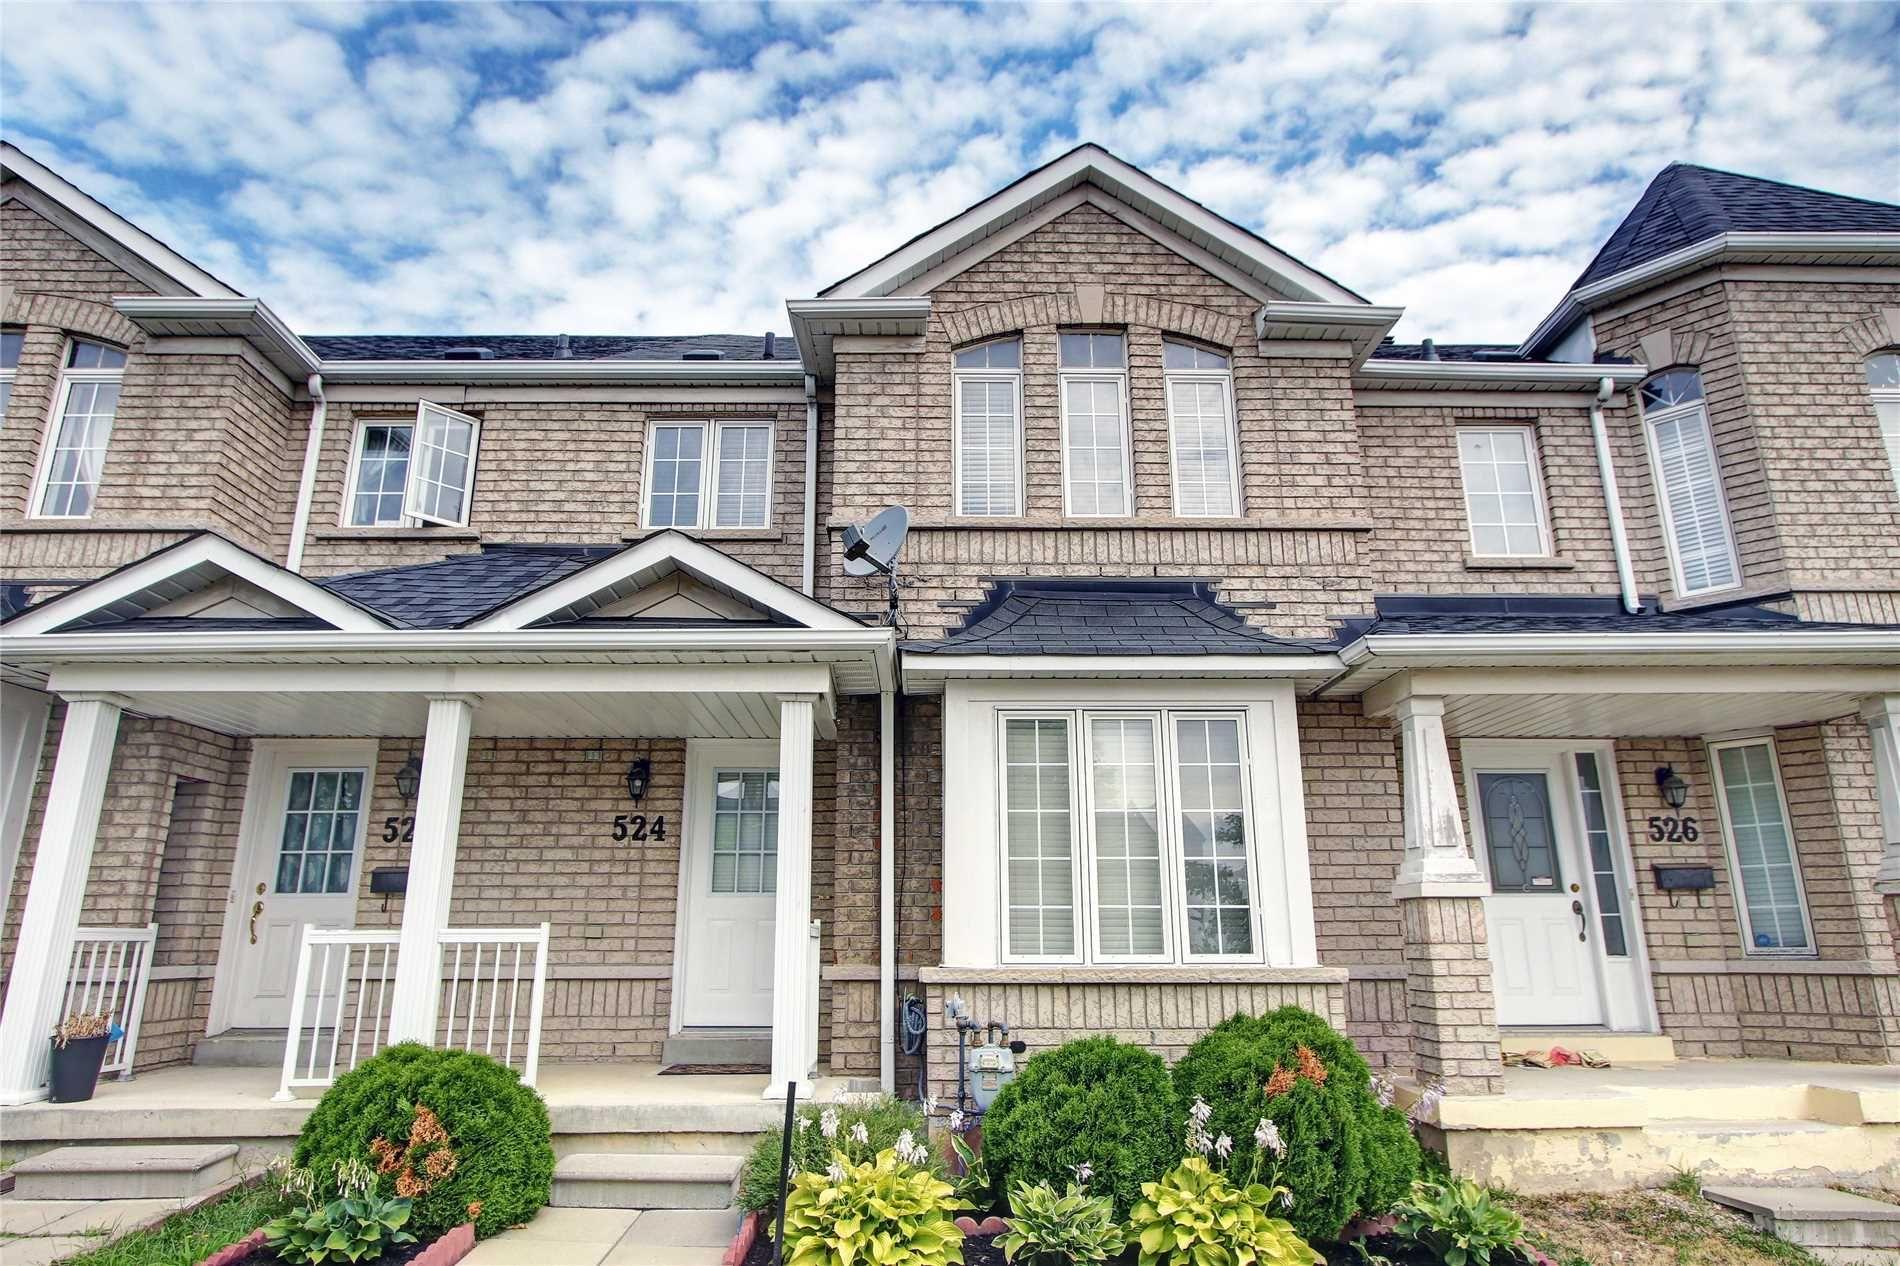 Main Photo: 524 Bur Oak Avenue in Markham: Berczy House (2-Storey) for sale : MLS®# N4529567